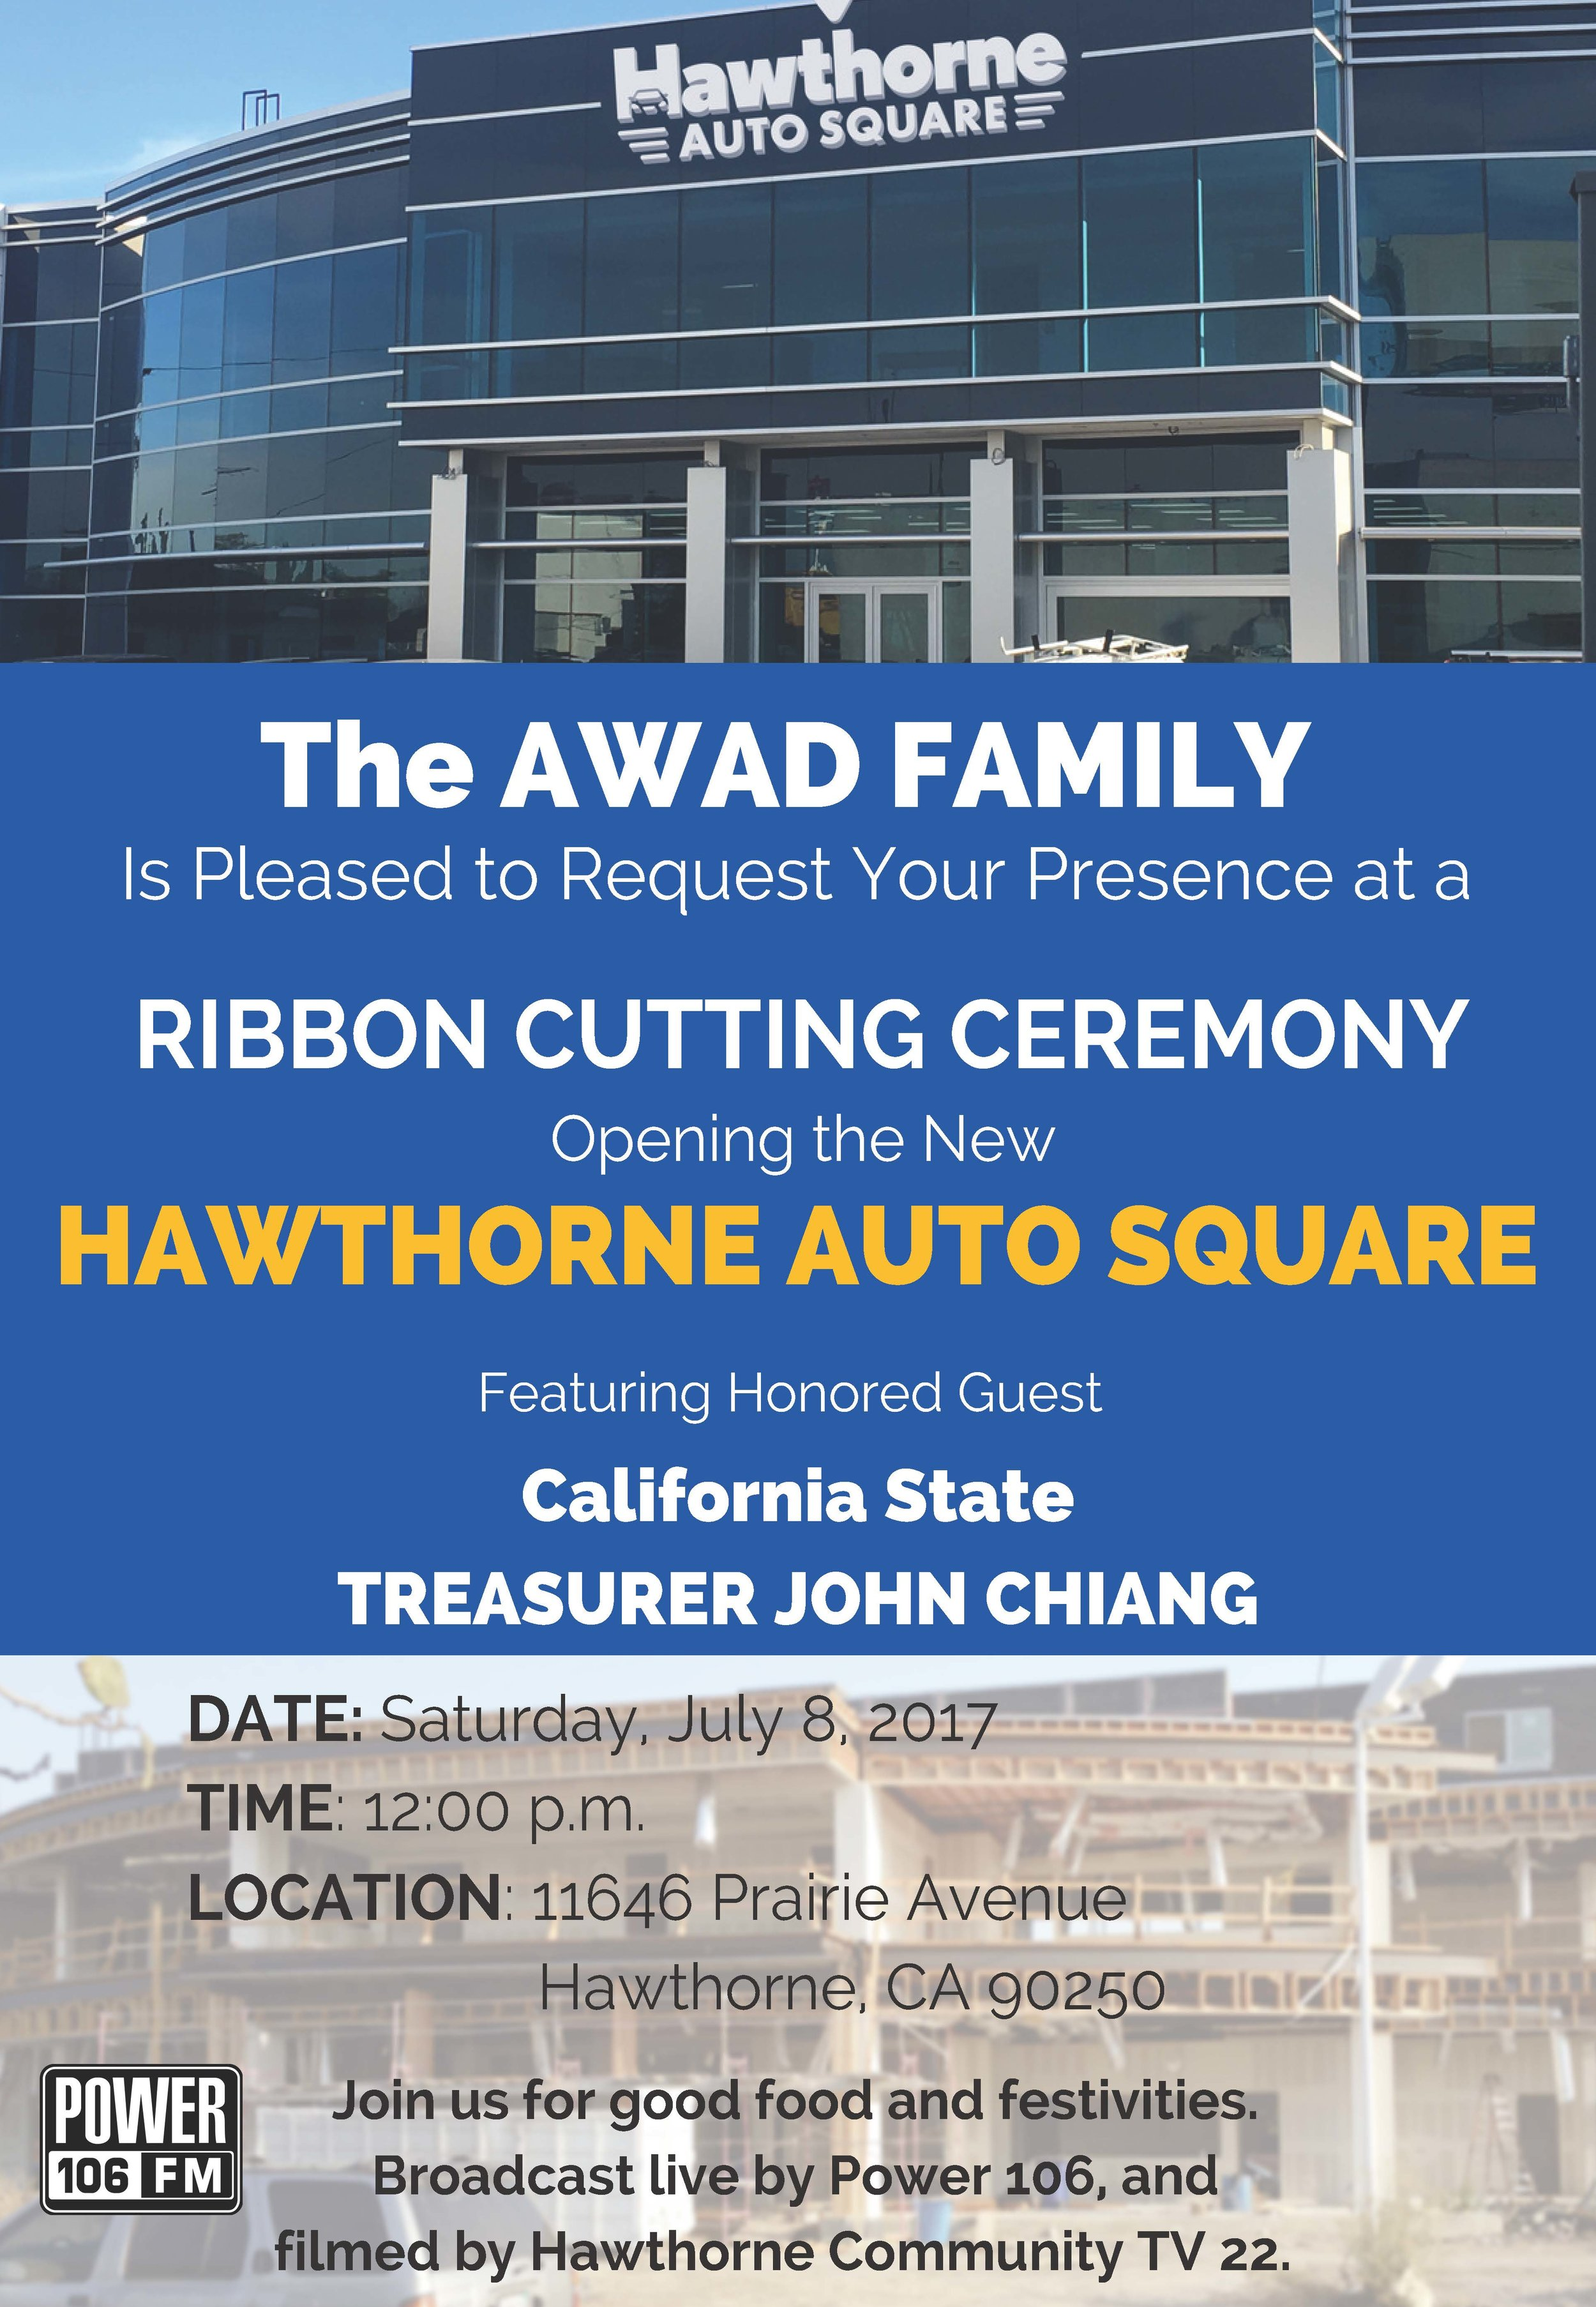 Hawthorne Auto Square Ribbon Cutting